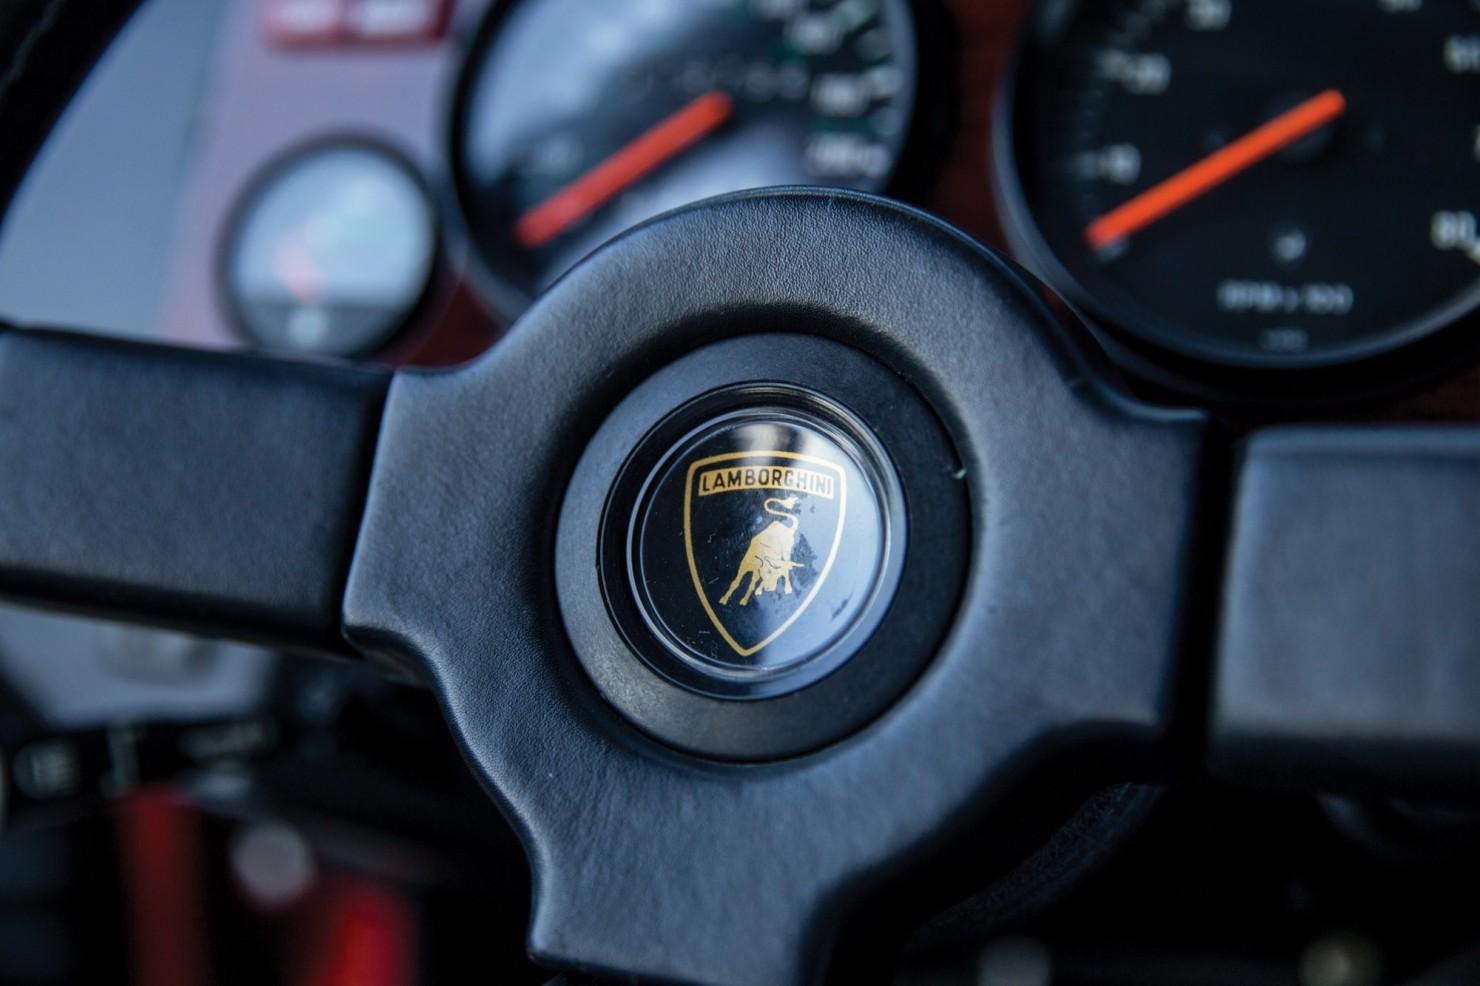 Lamborghini-LM002-10